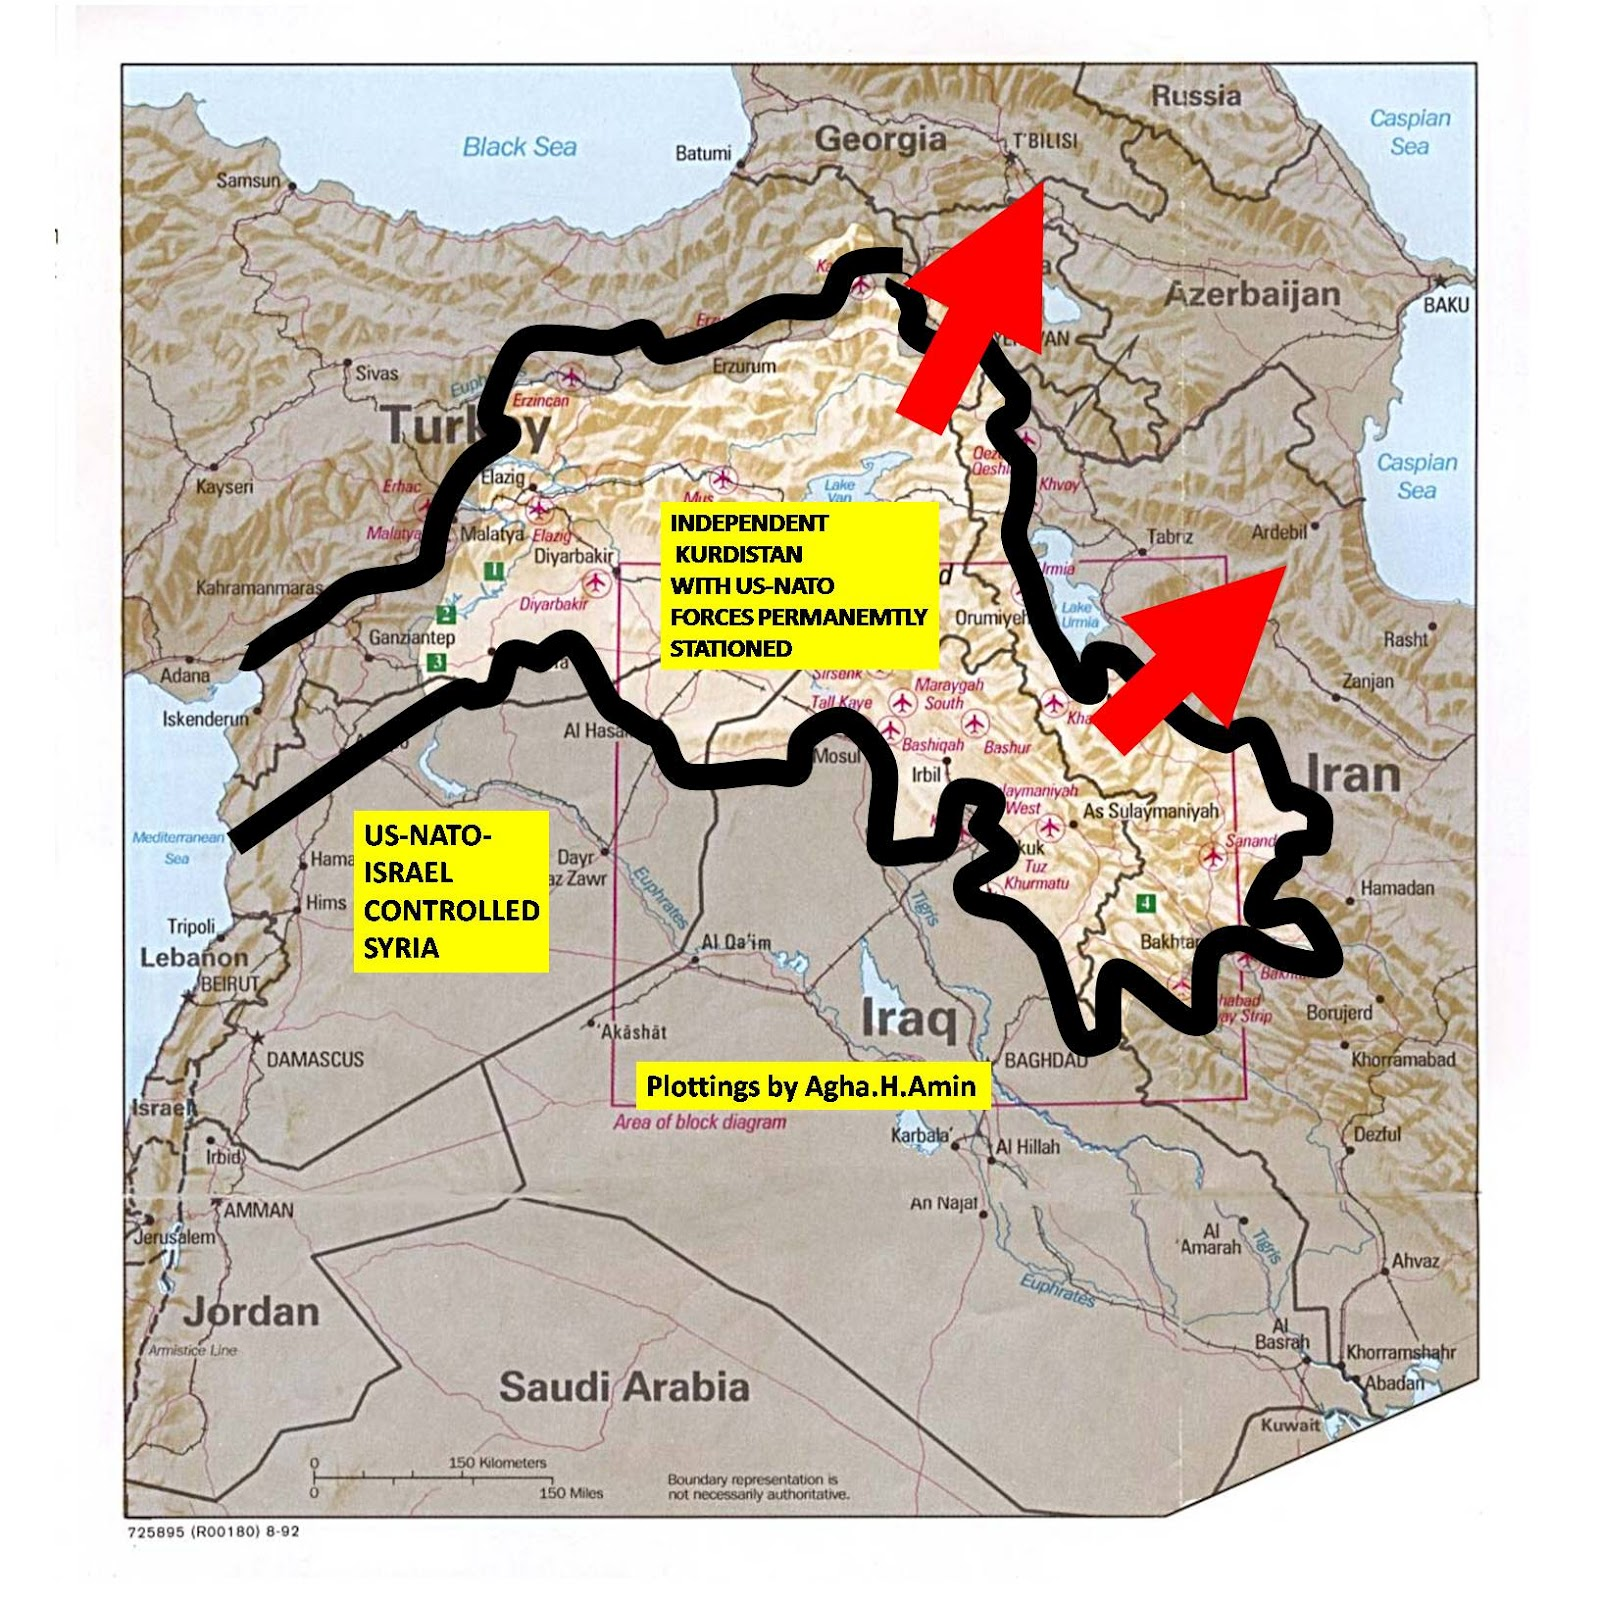 http://3.bp.blogspot.com/-z6kCKnCKisE/T-aV-Wu-H9I/AAAAAAAArkY/zF7_VEVfNxk/s1600/Kurdish%2BSyrian%2BStrat%2BScenario.jpg